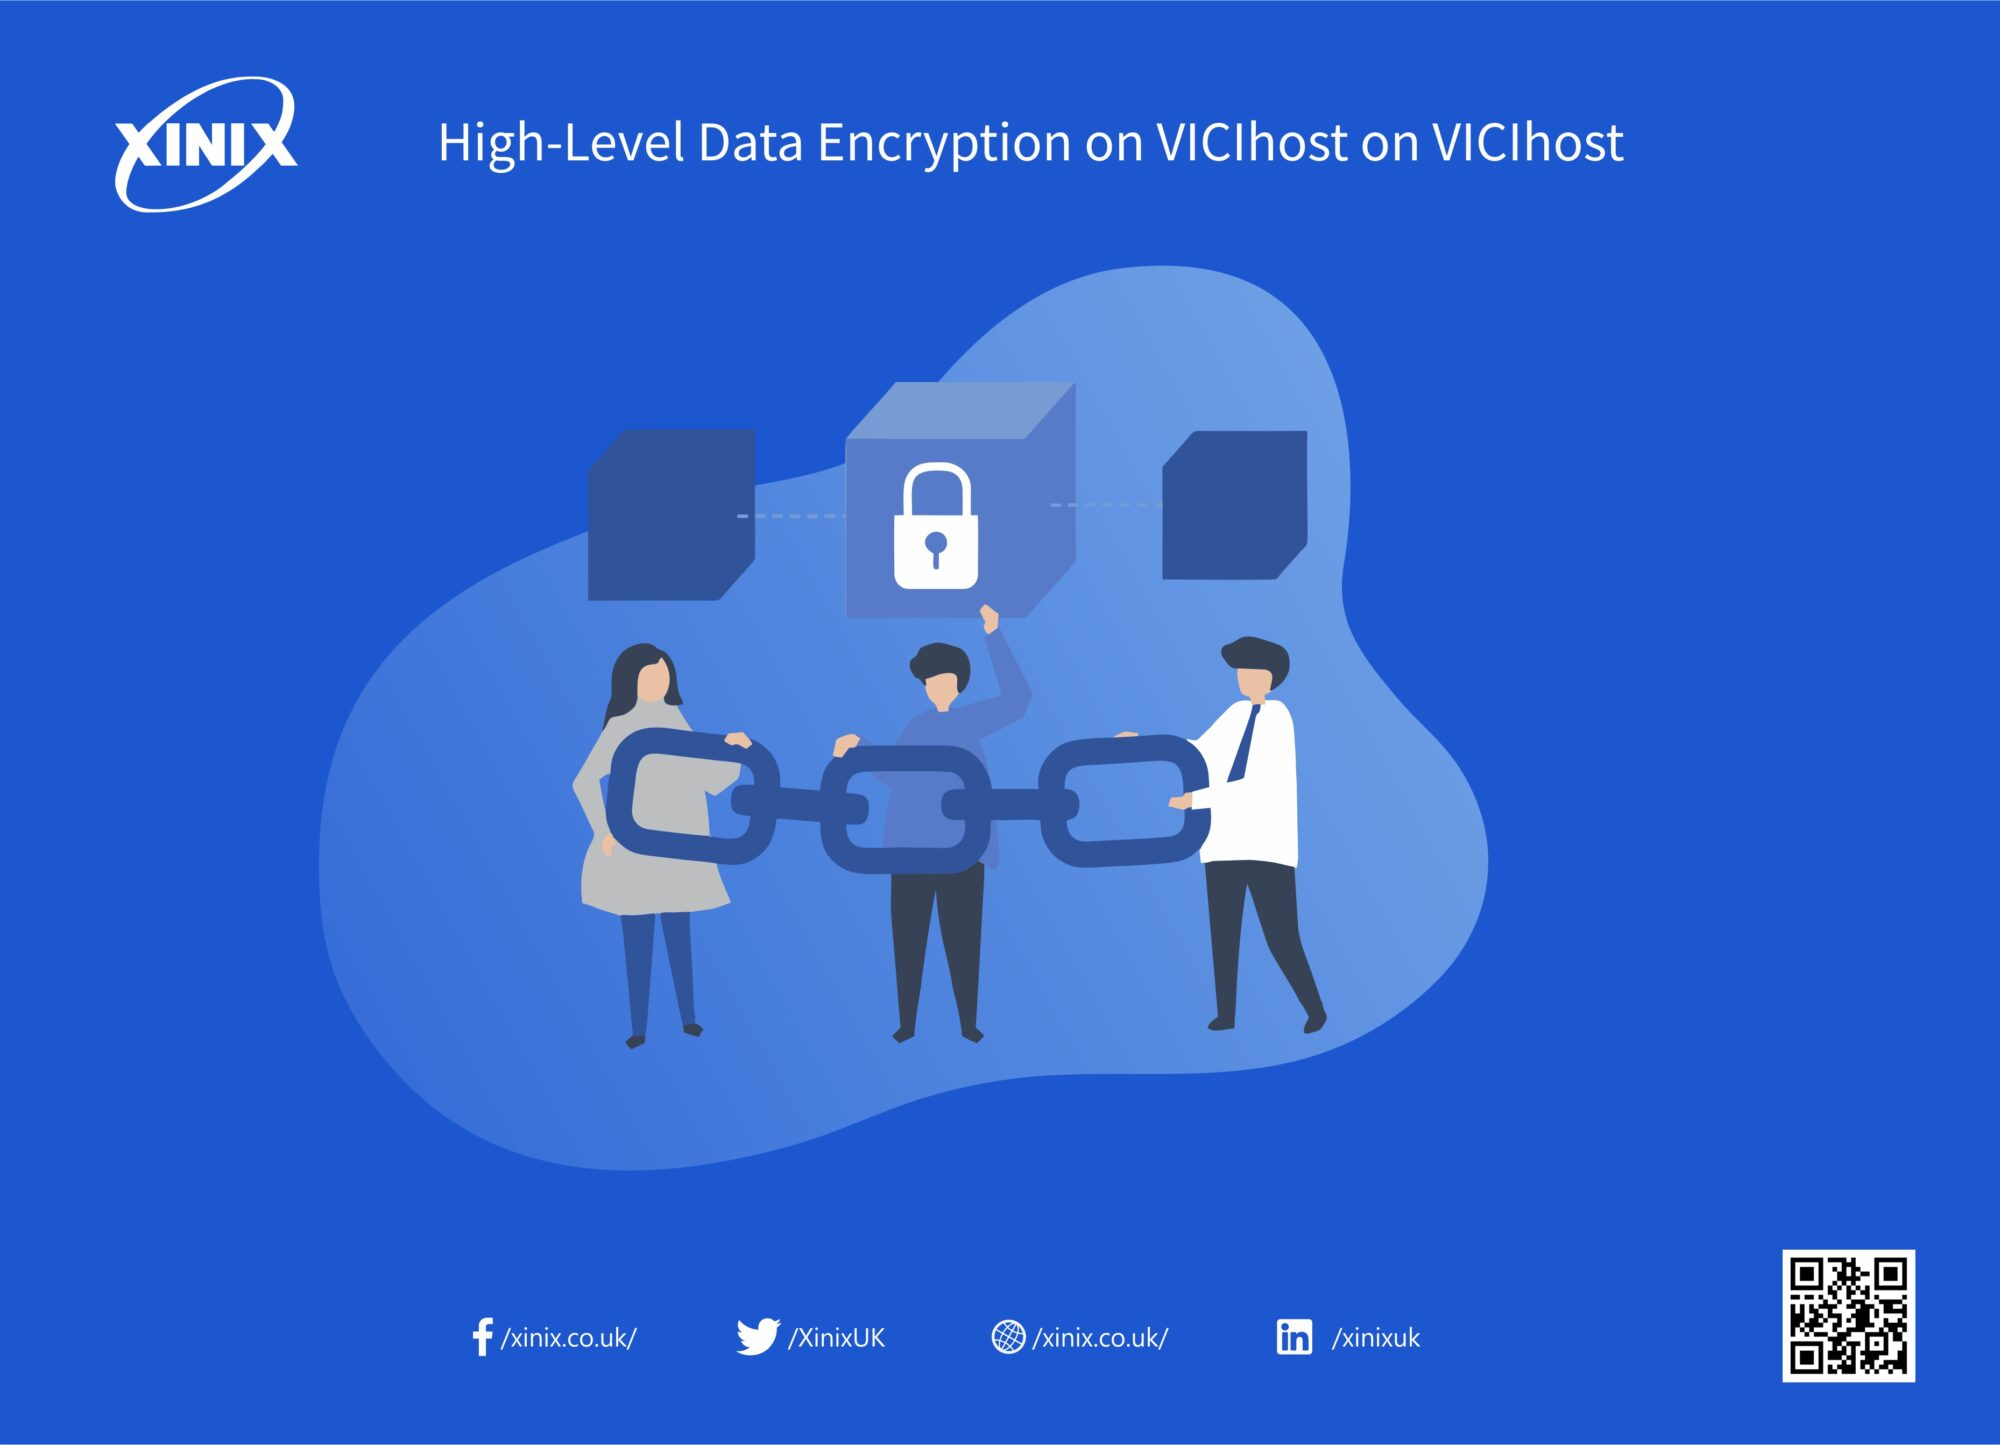 High-Level Data Encryption on VICIhost on VICIhost